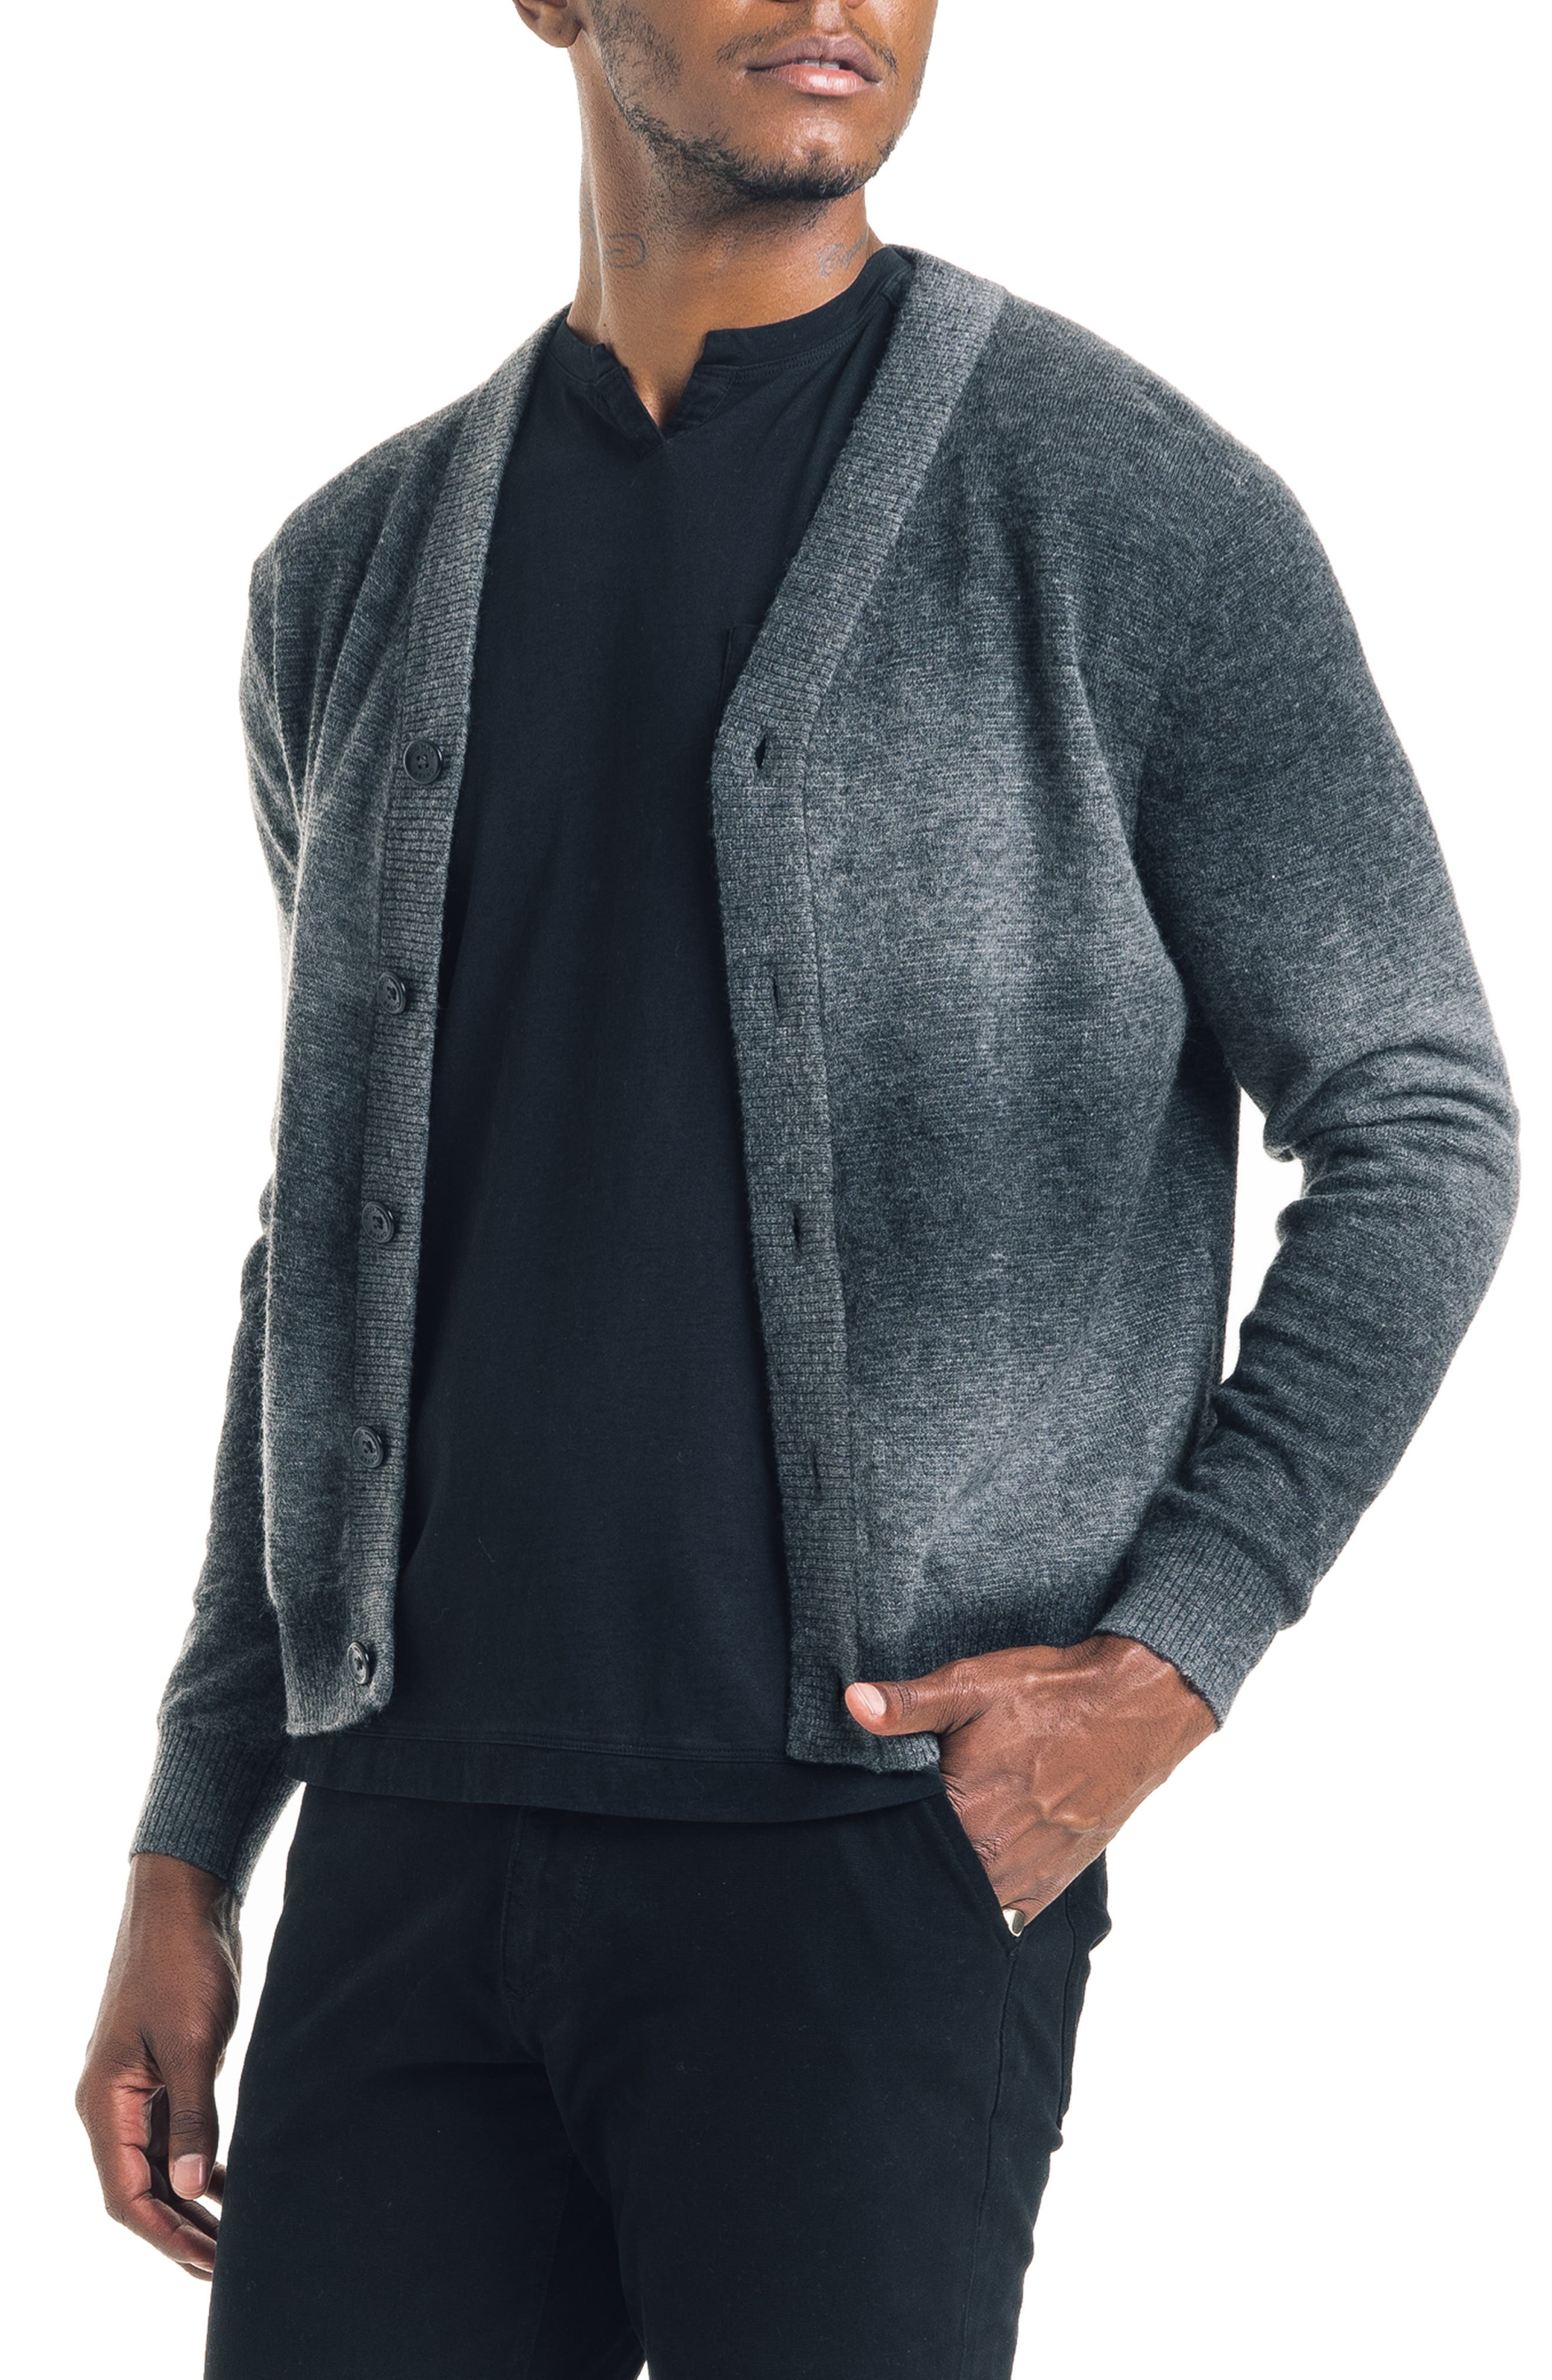 Modern Slim Fit Merino Wool Blend Cardigan,                             Main thumbnail 1, color,                             BLACK / GREY